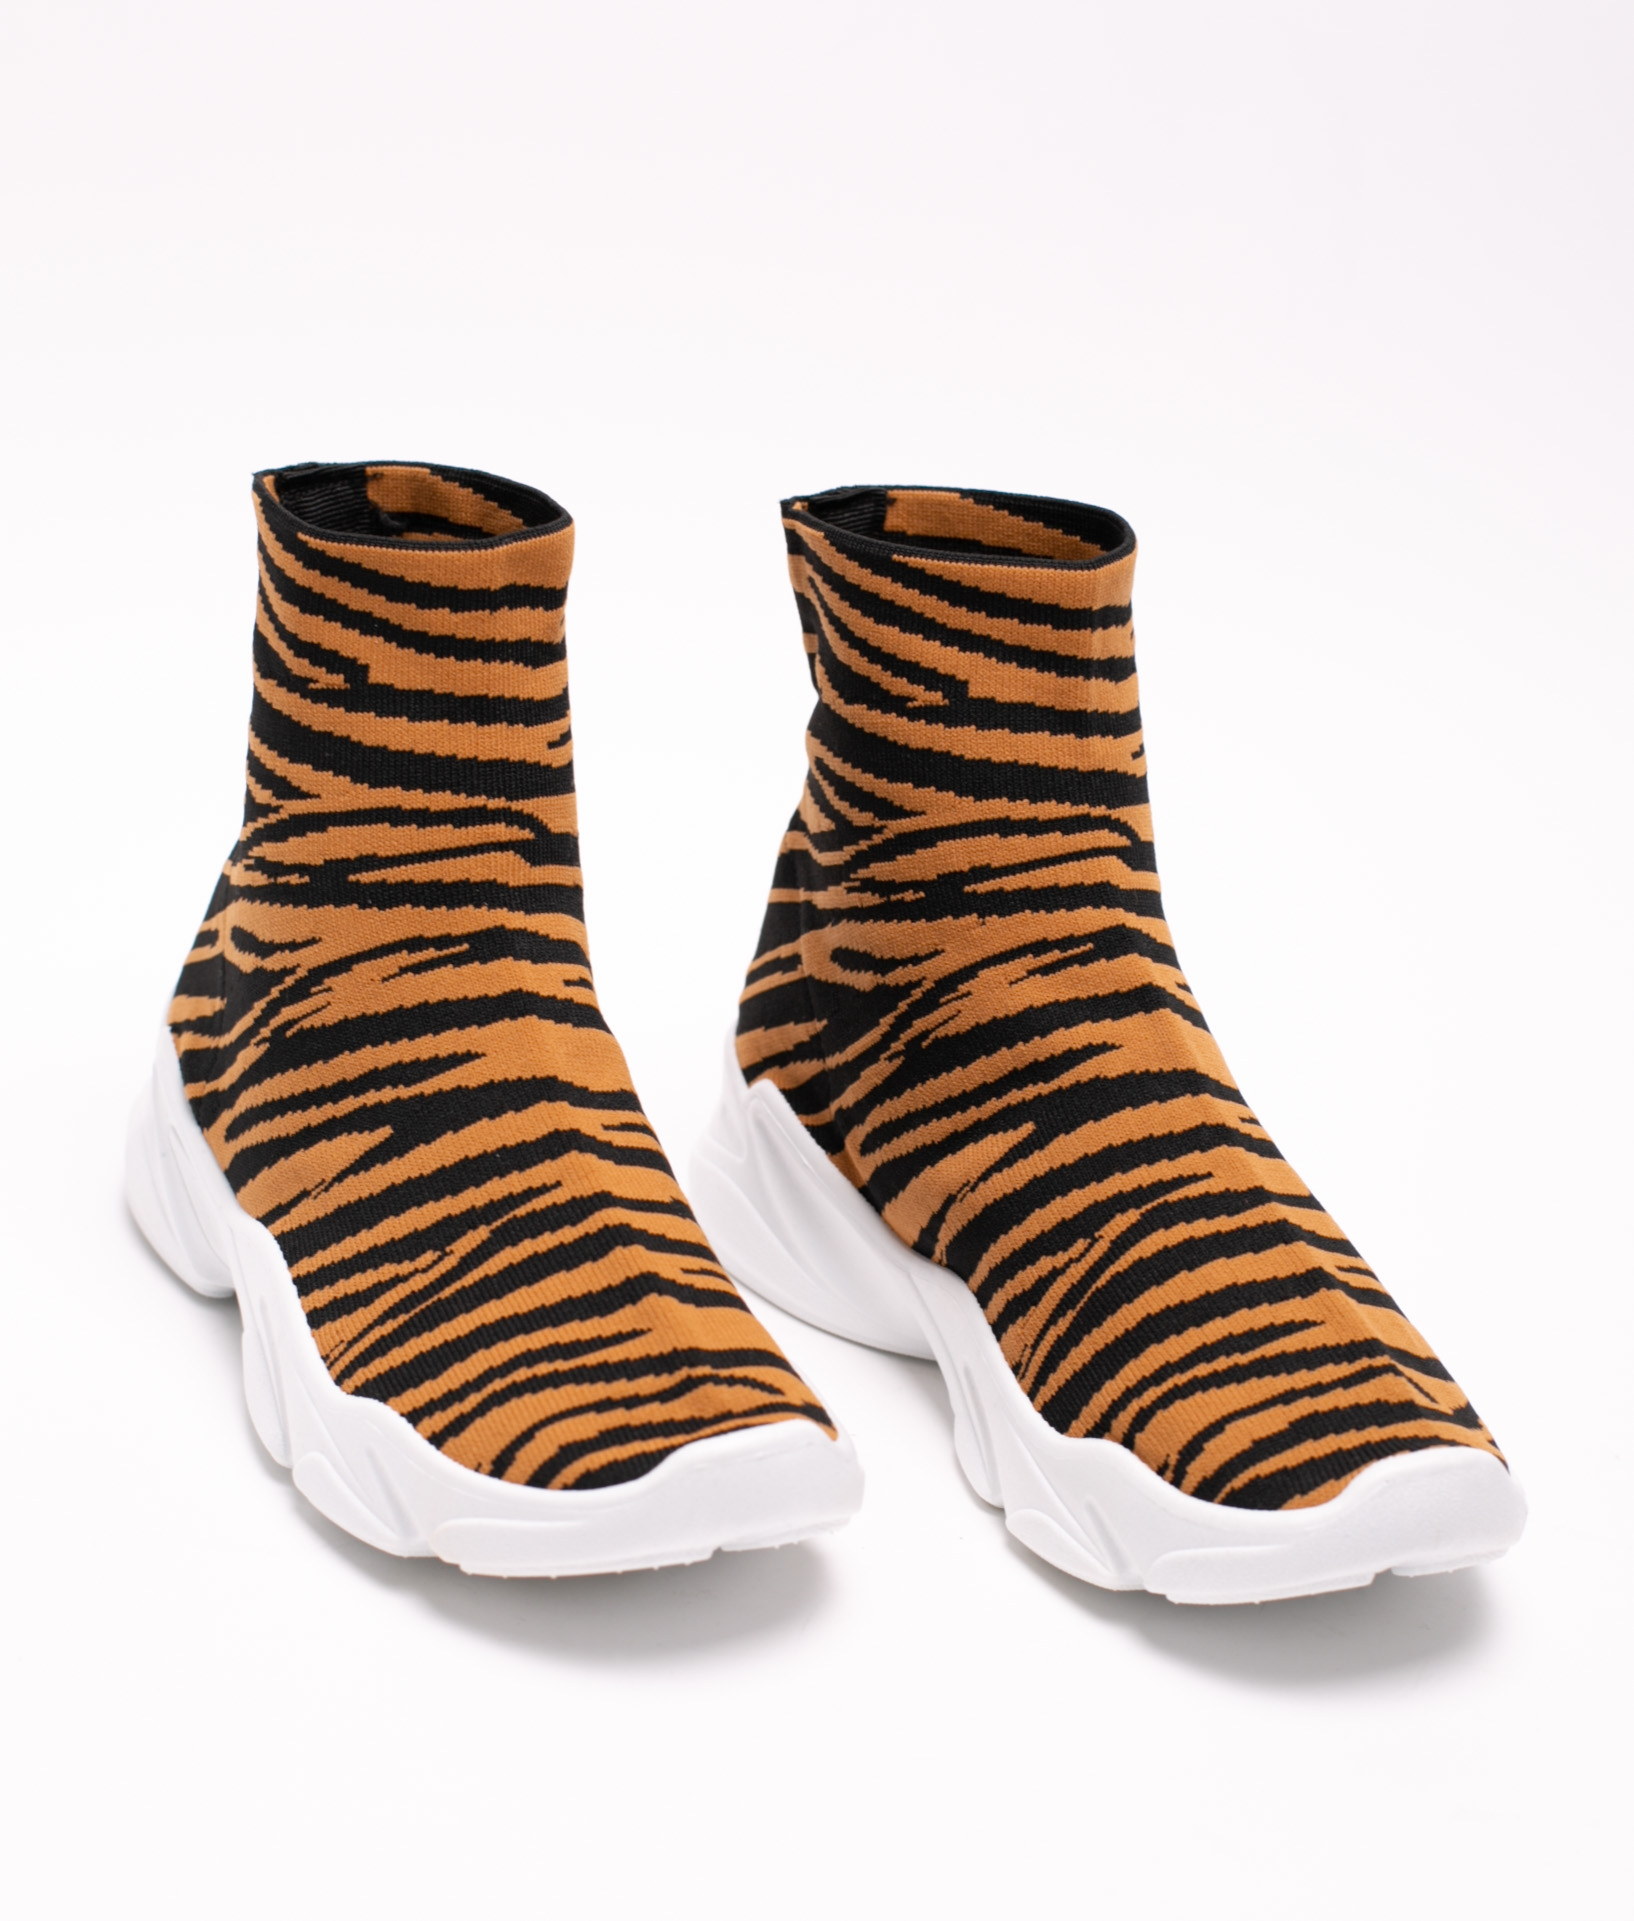 Sneakers Landi - Camelo